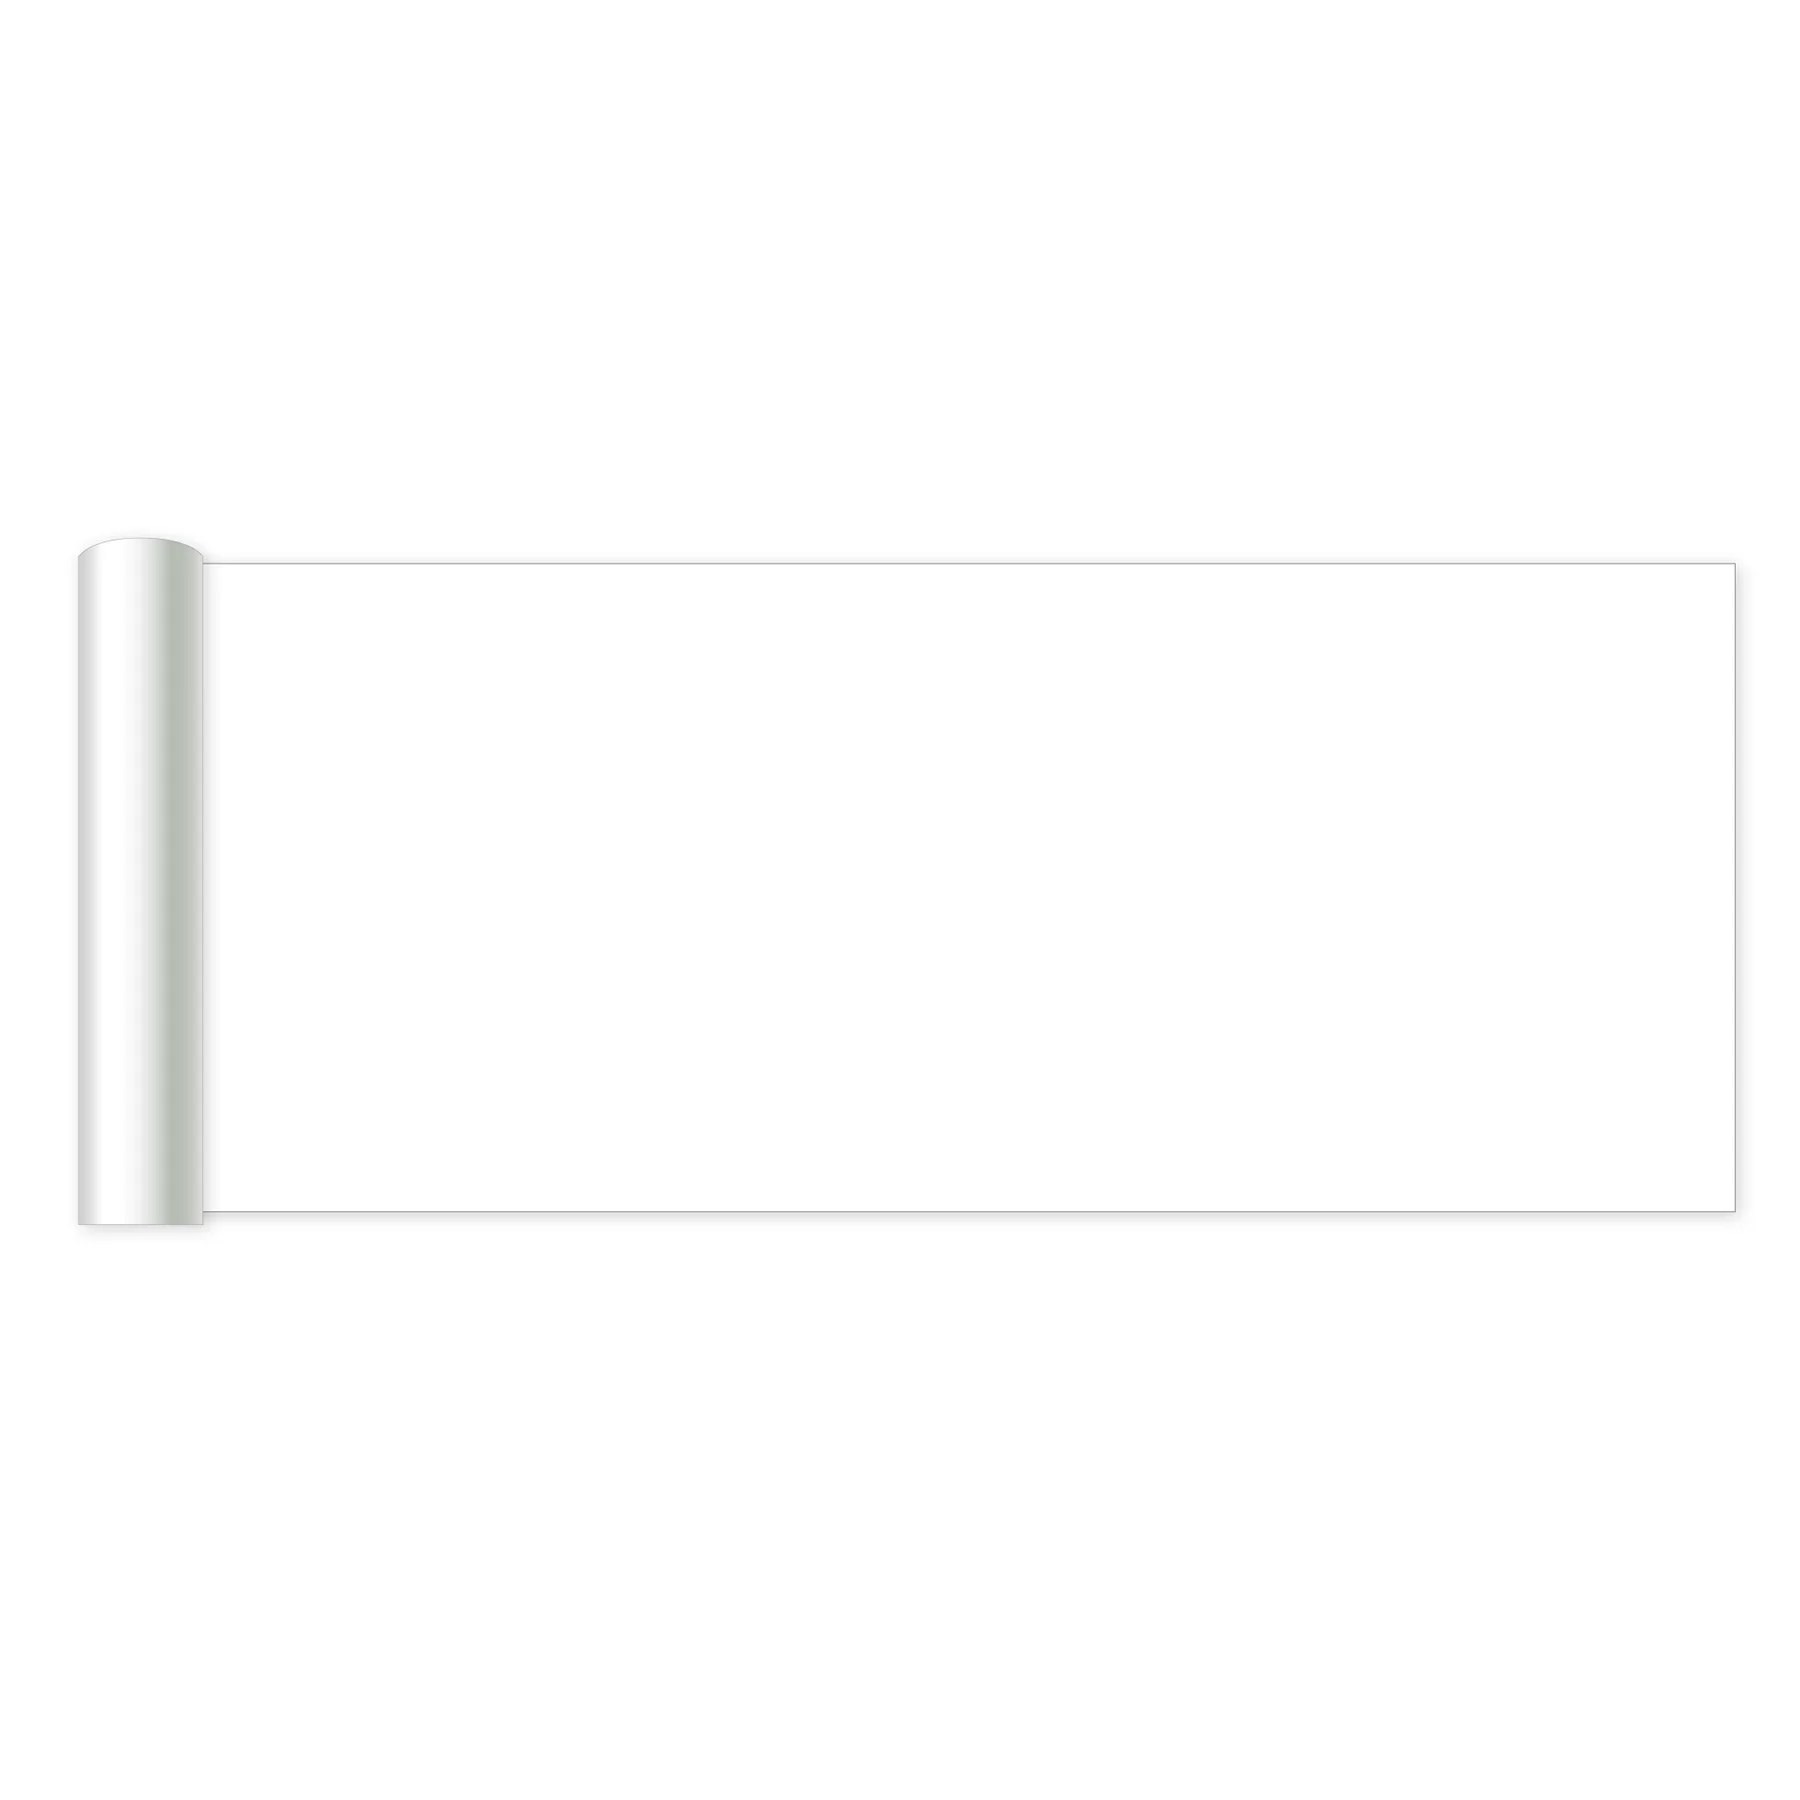 Wallpops Wallpops Dry Erase Whiteboard Wall Decal